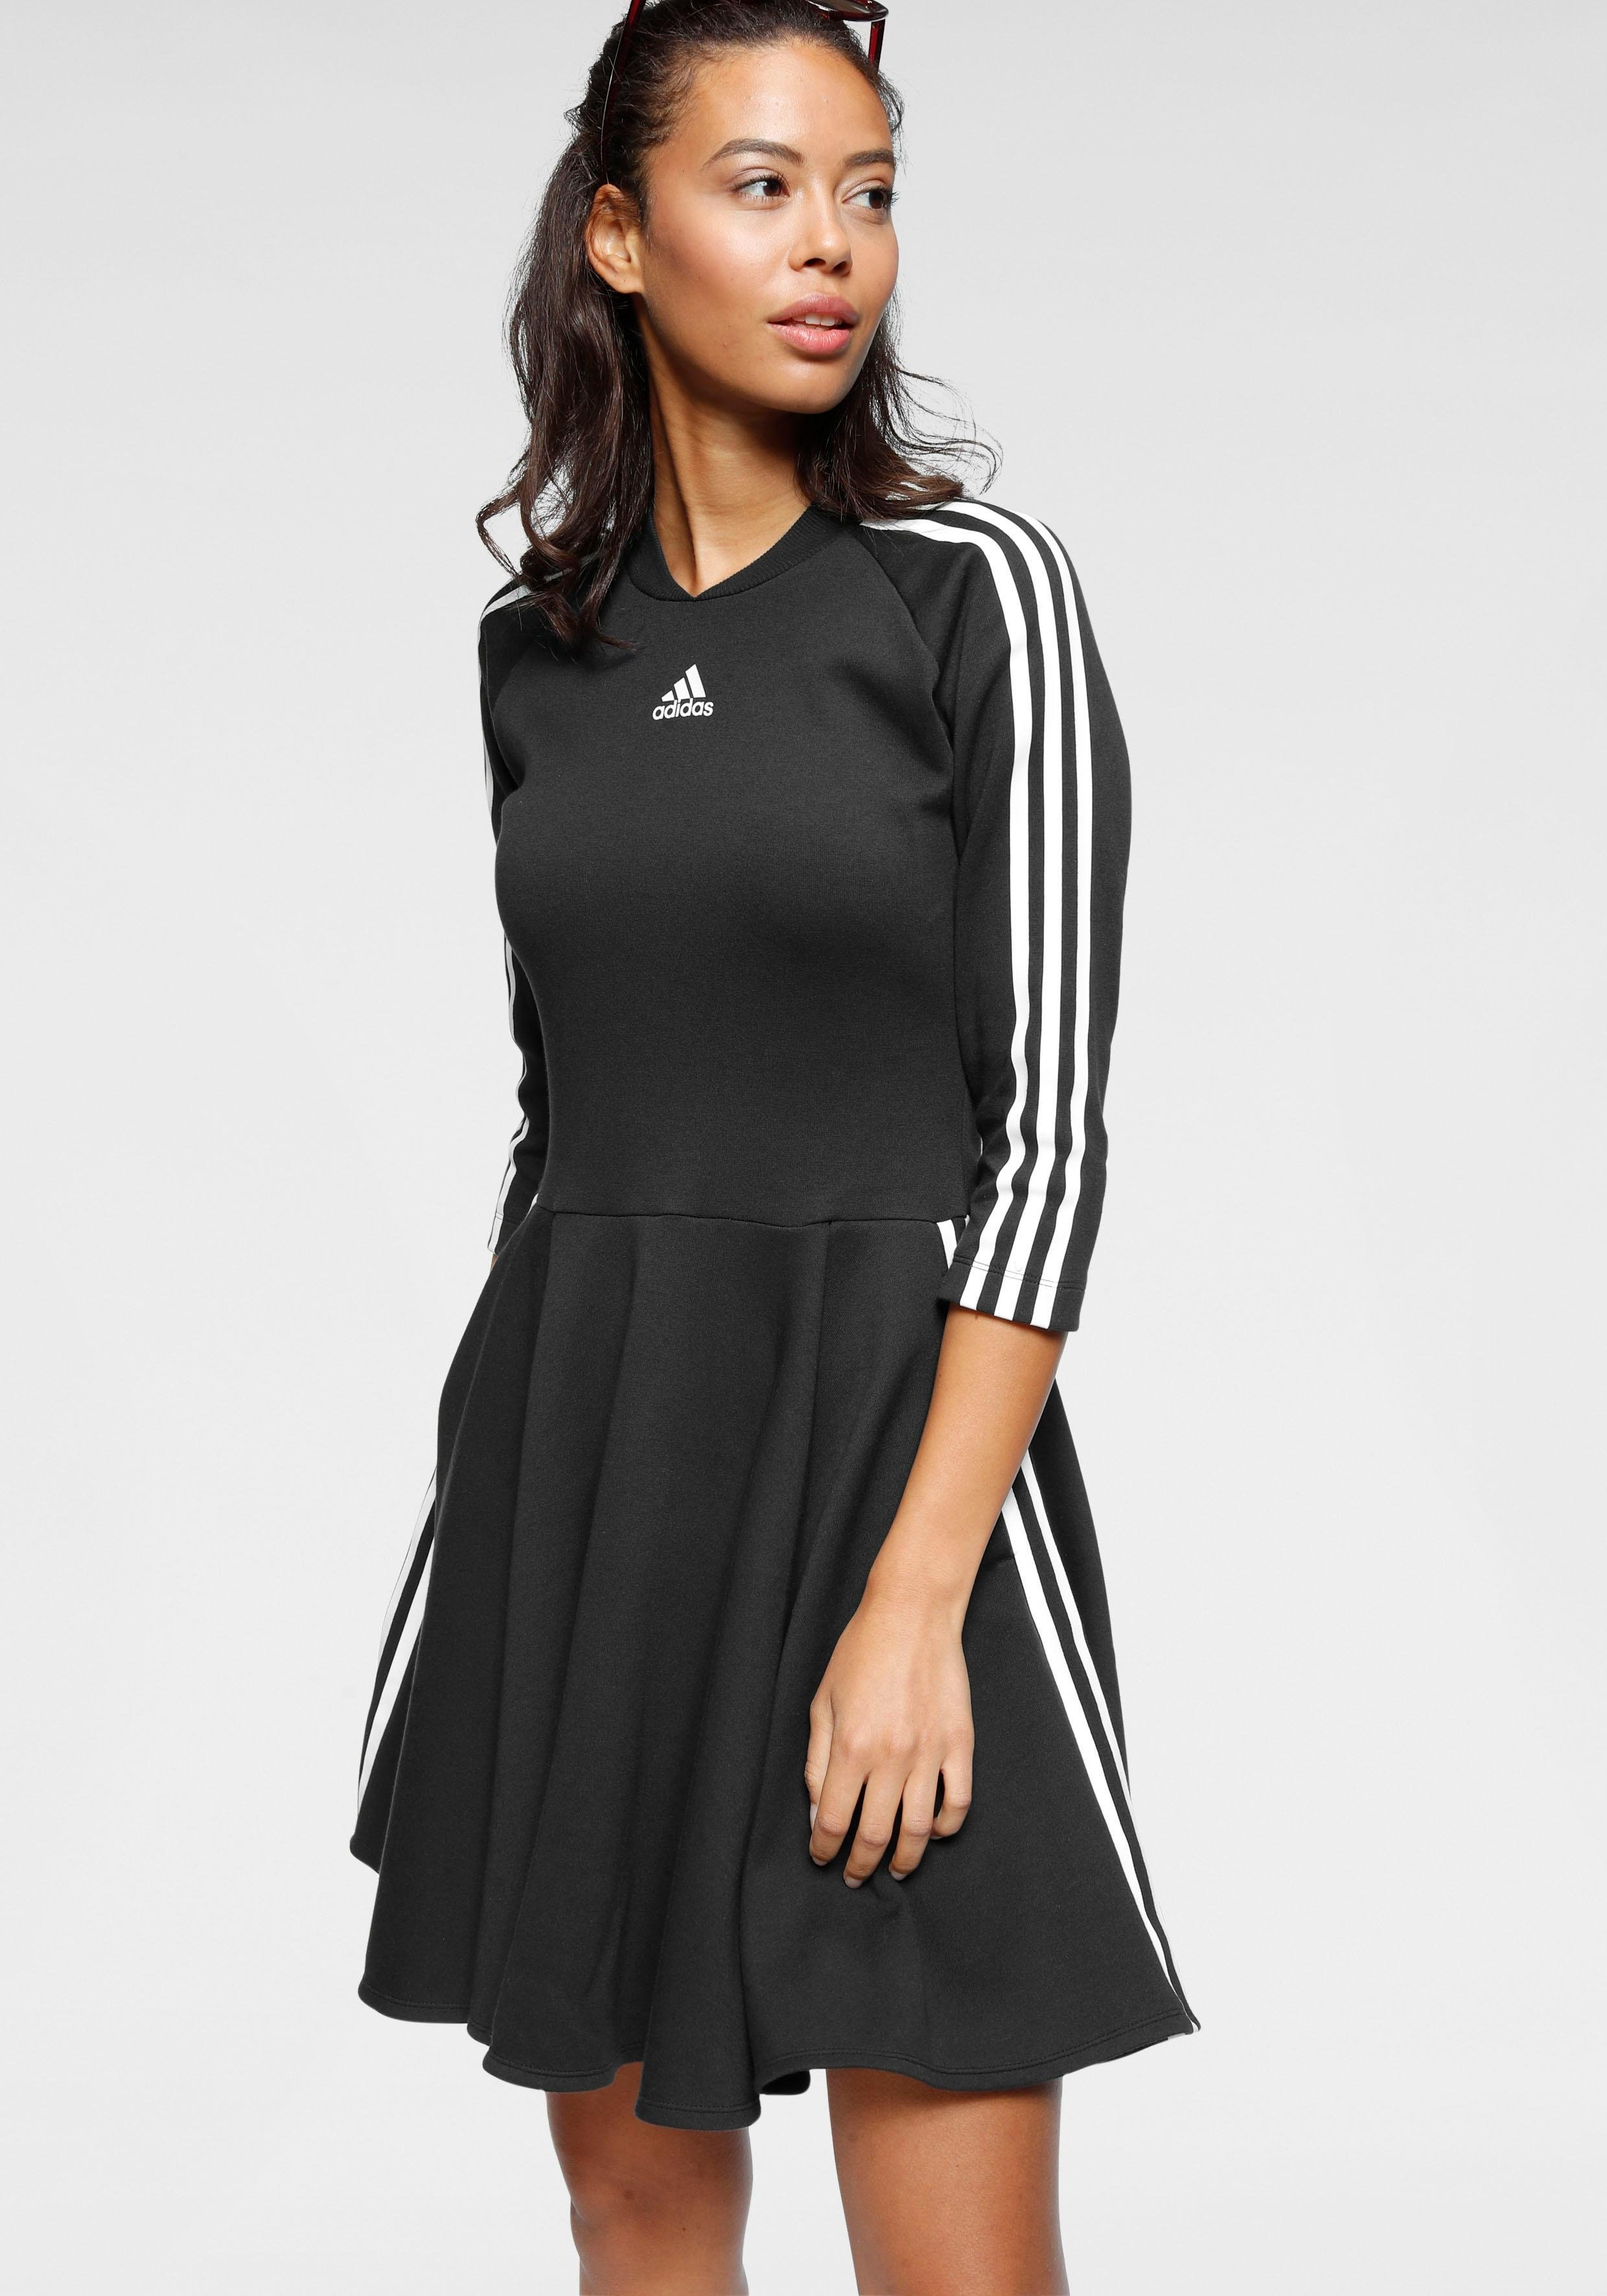 adidas Performance jerseyjurk »3 STRIPES DRESS« bestellen: 30 dagen bedenktijd